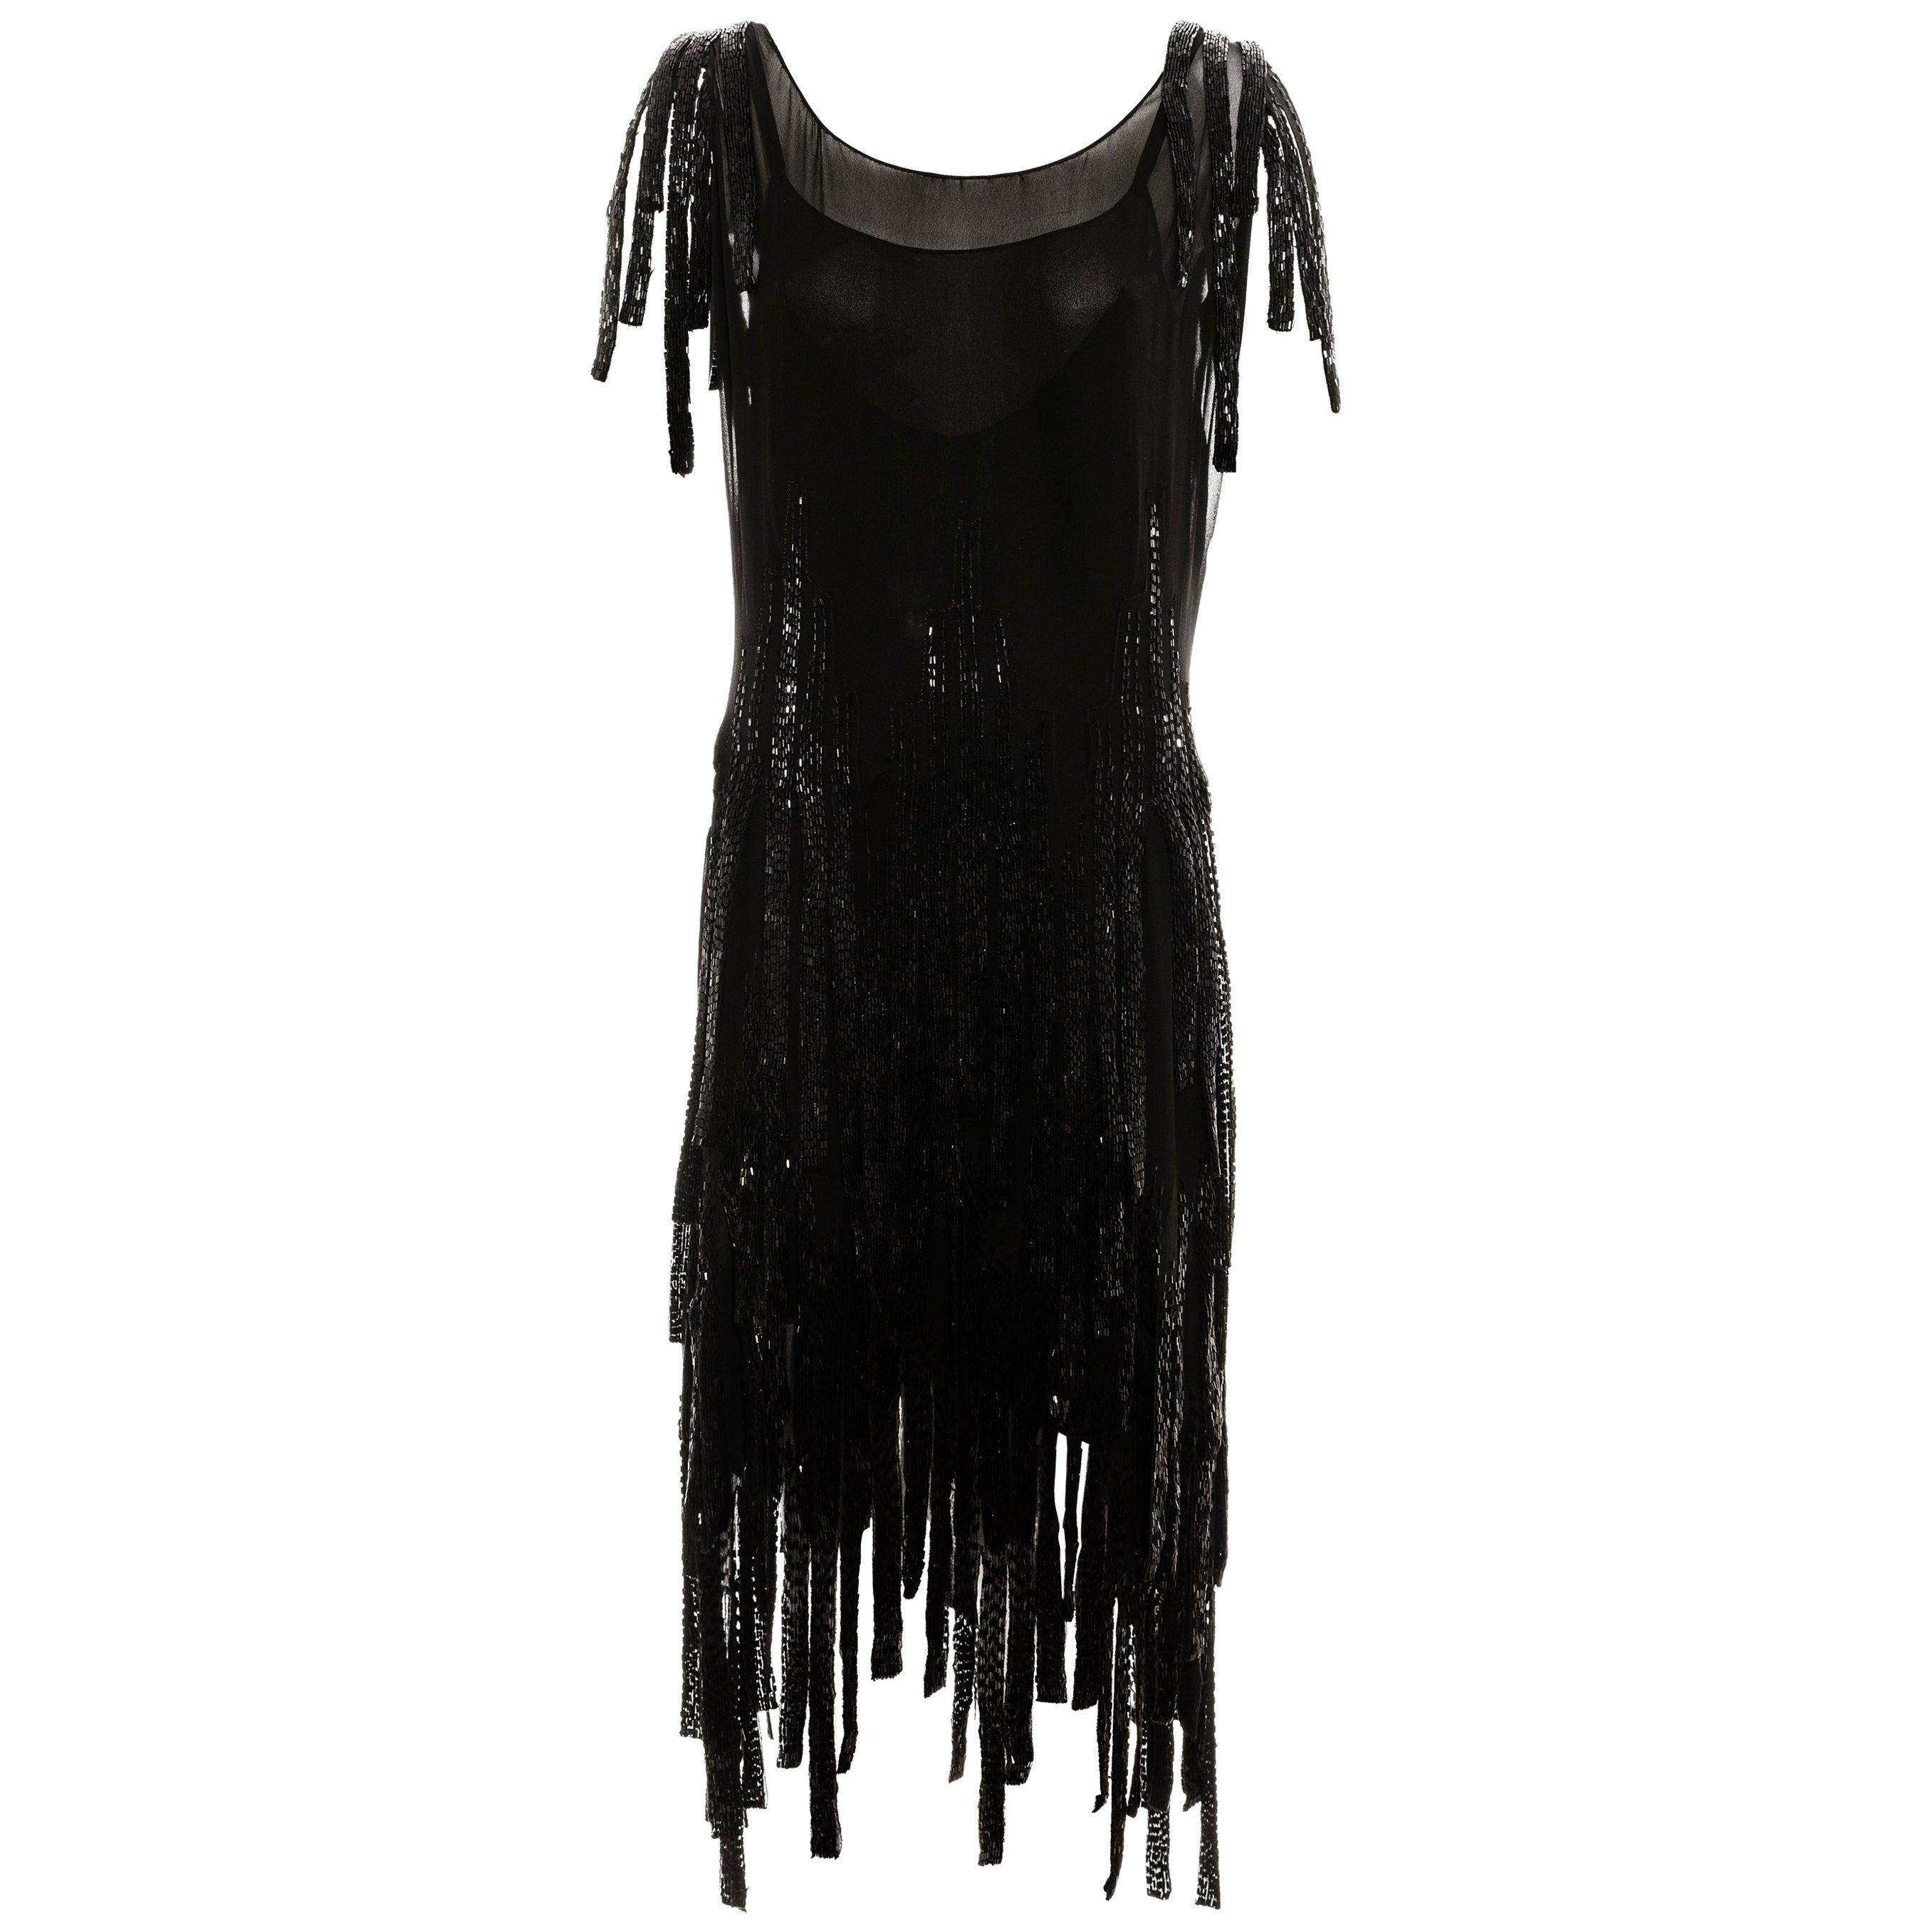 Gabrielle Chanel couture black silk beaded flapper dress, c. 1924 - 1926